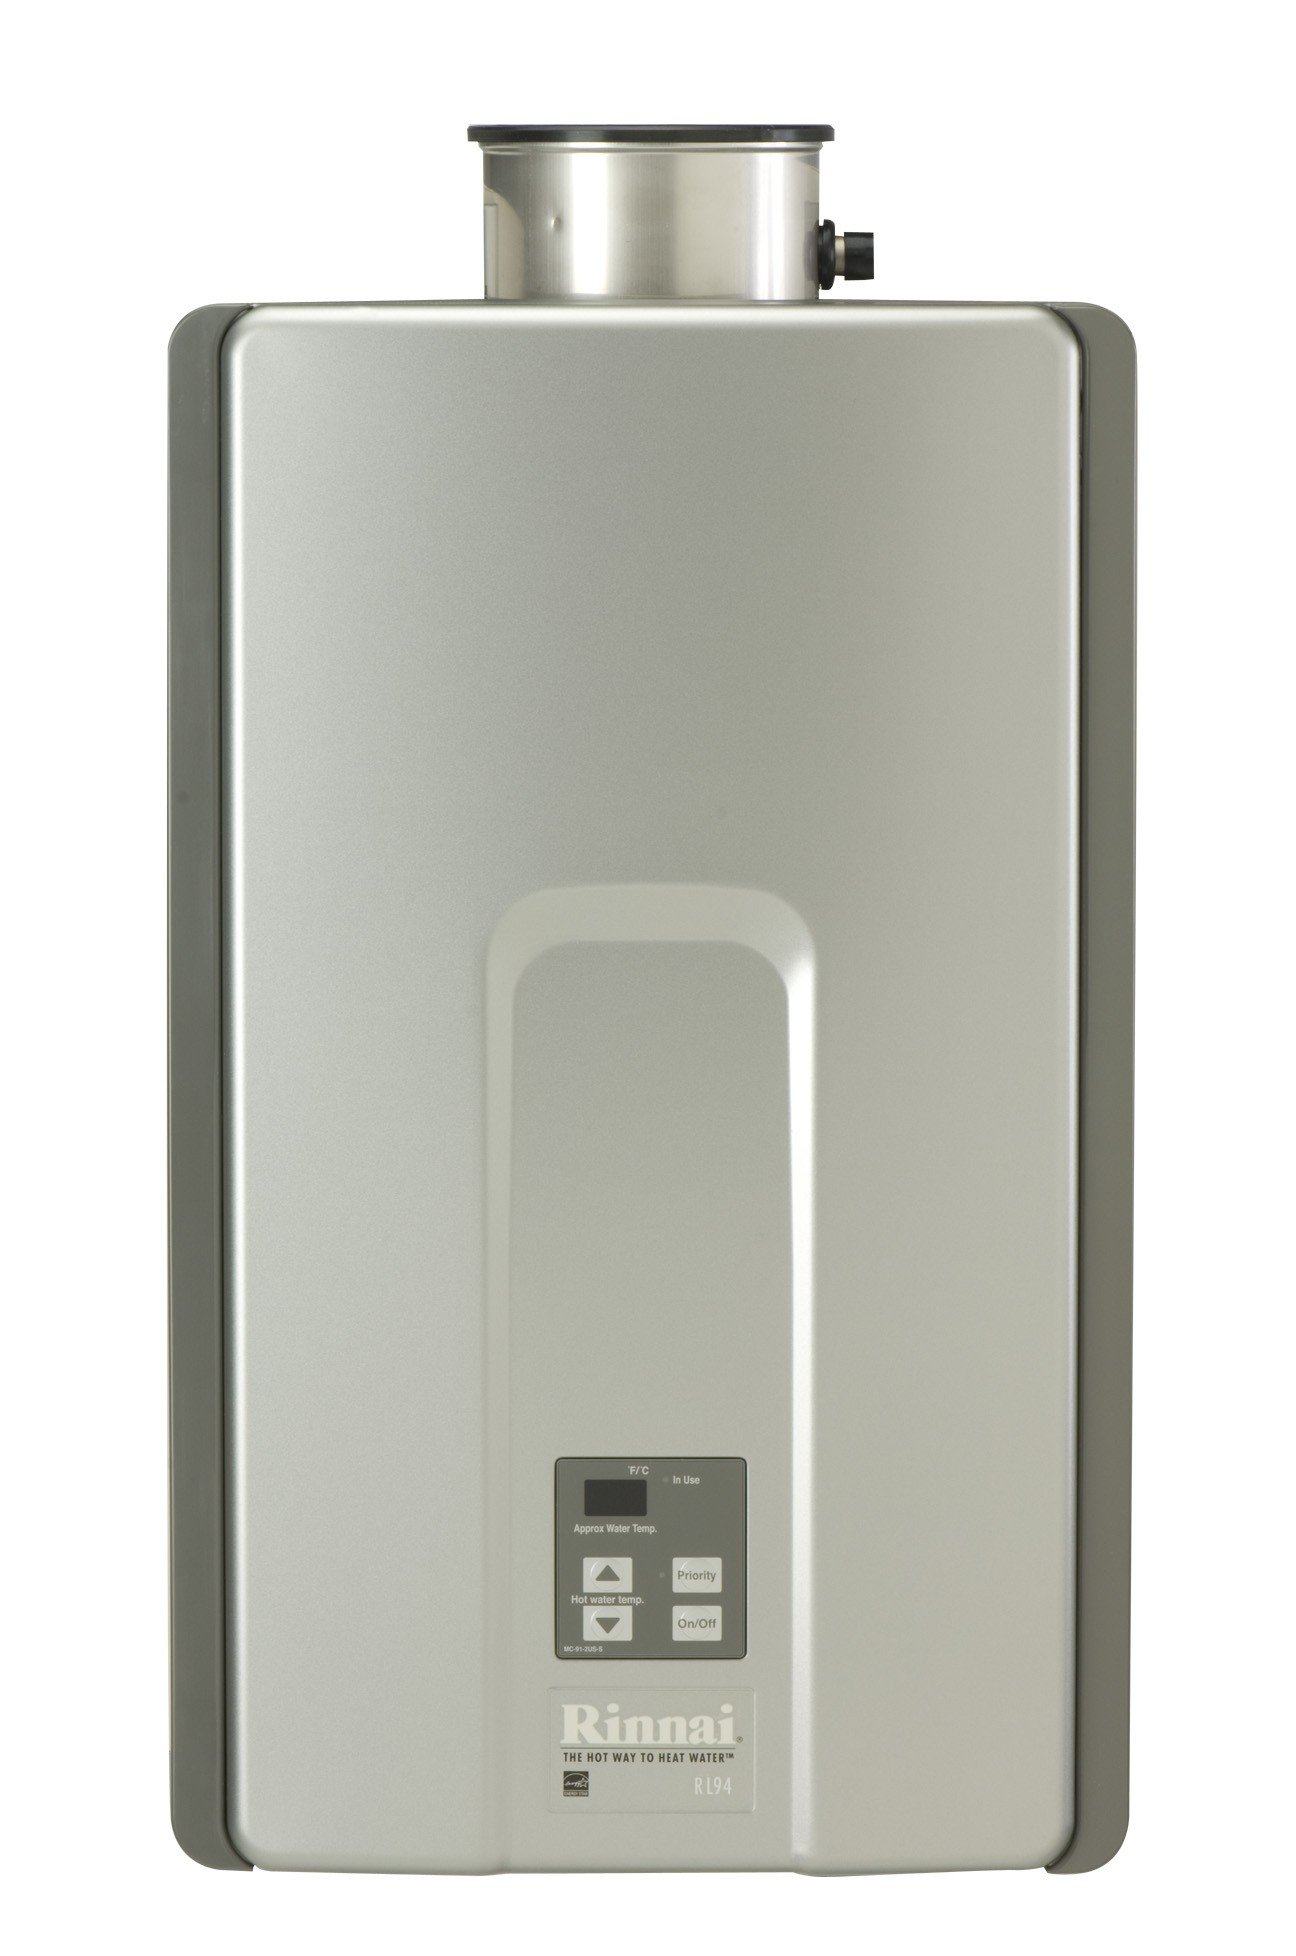 Rinnai RL94iP Propane Tankless Water Heater, 9.4 Gallons Per Minute